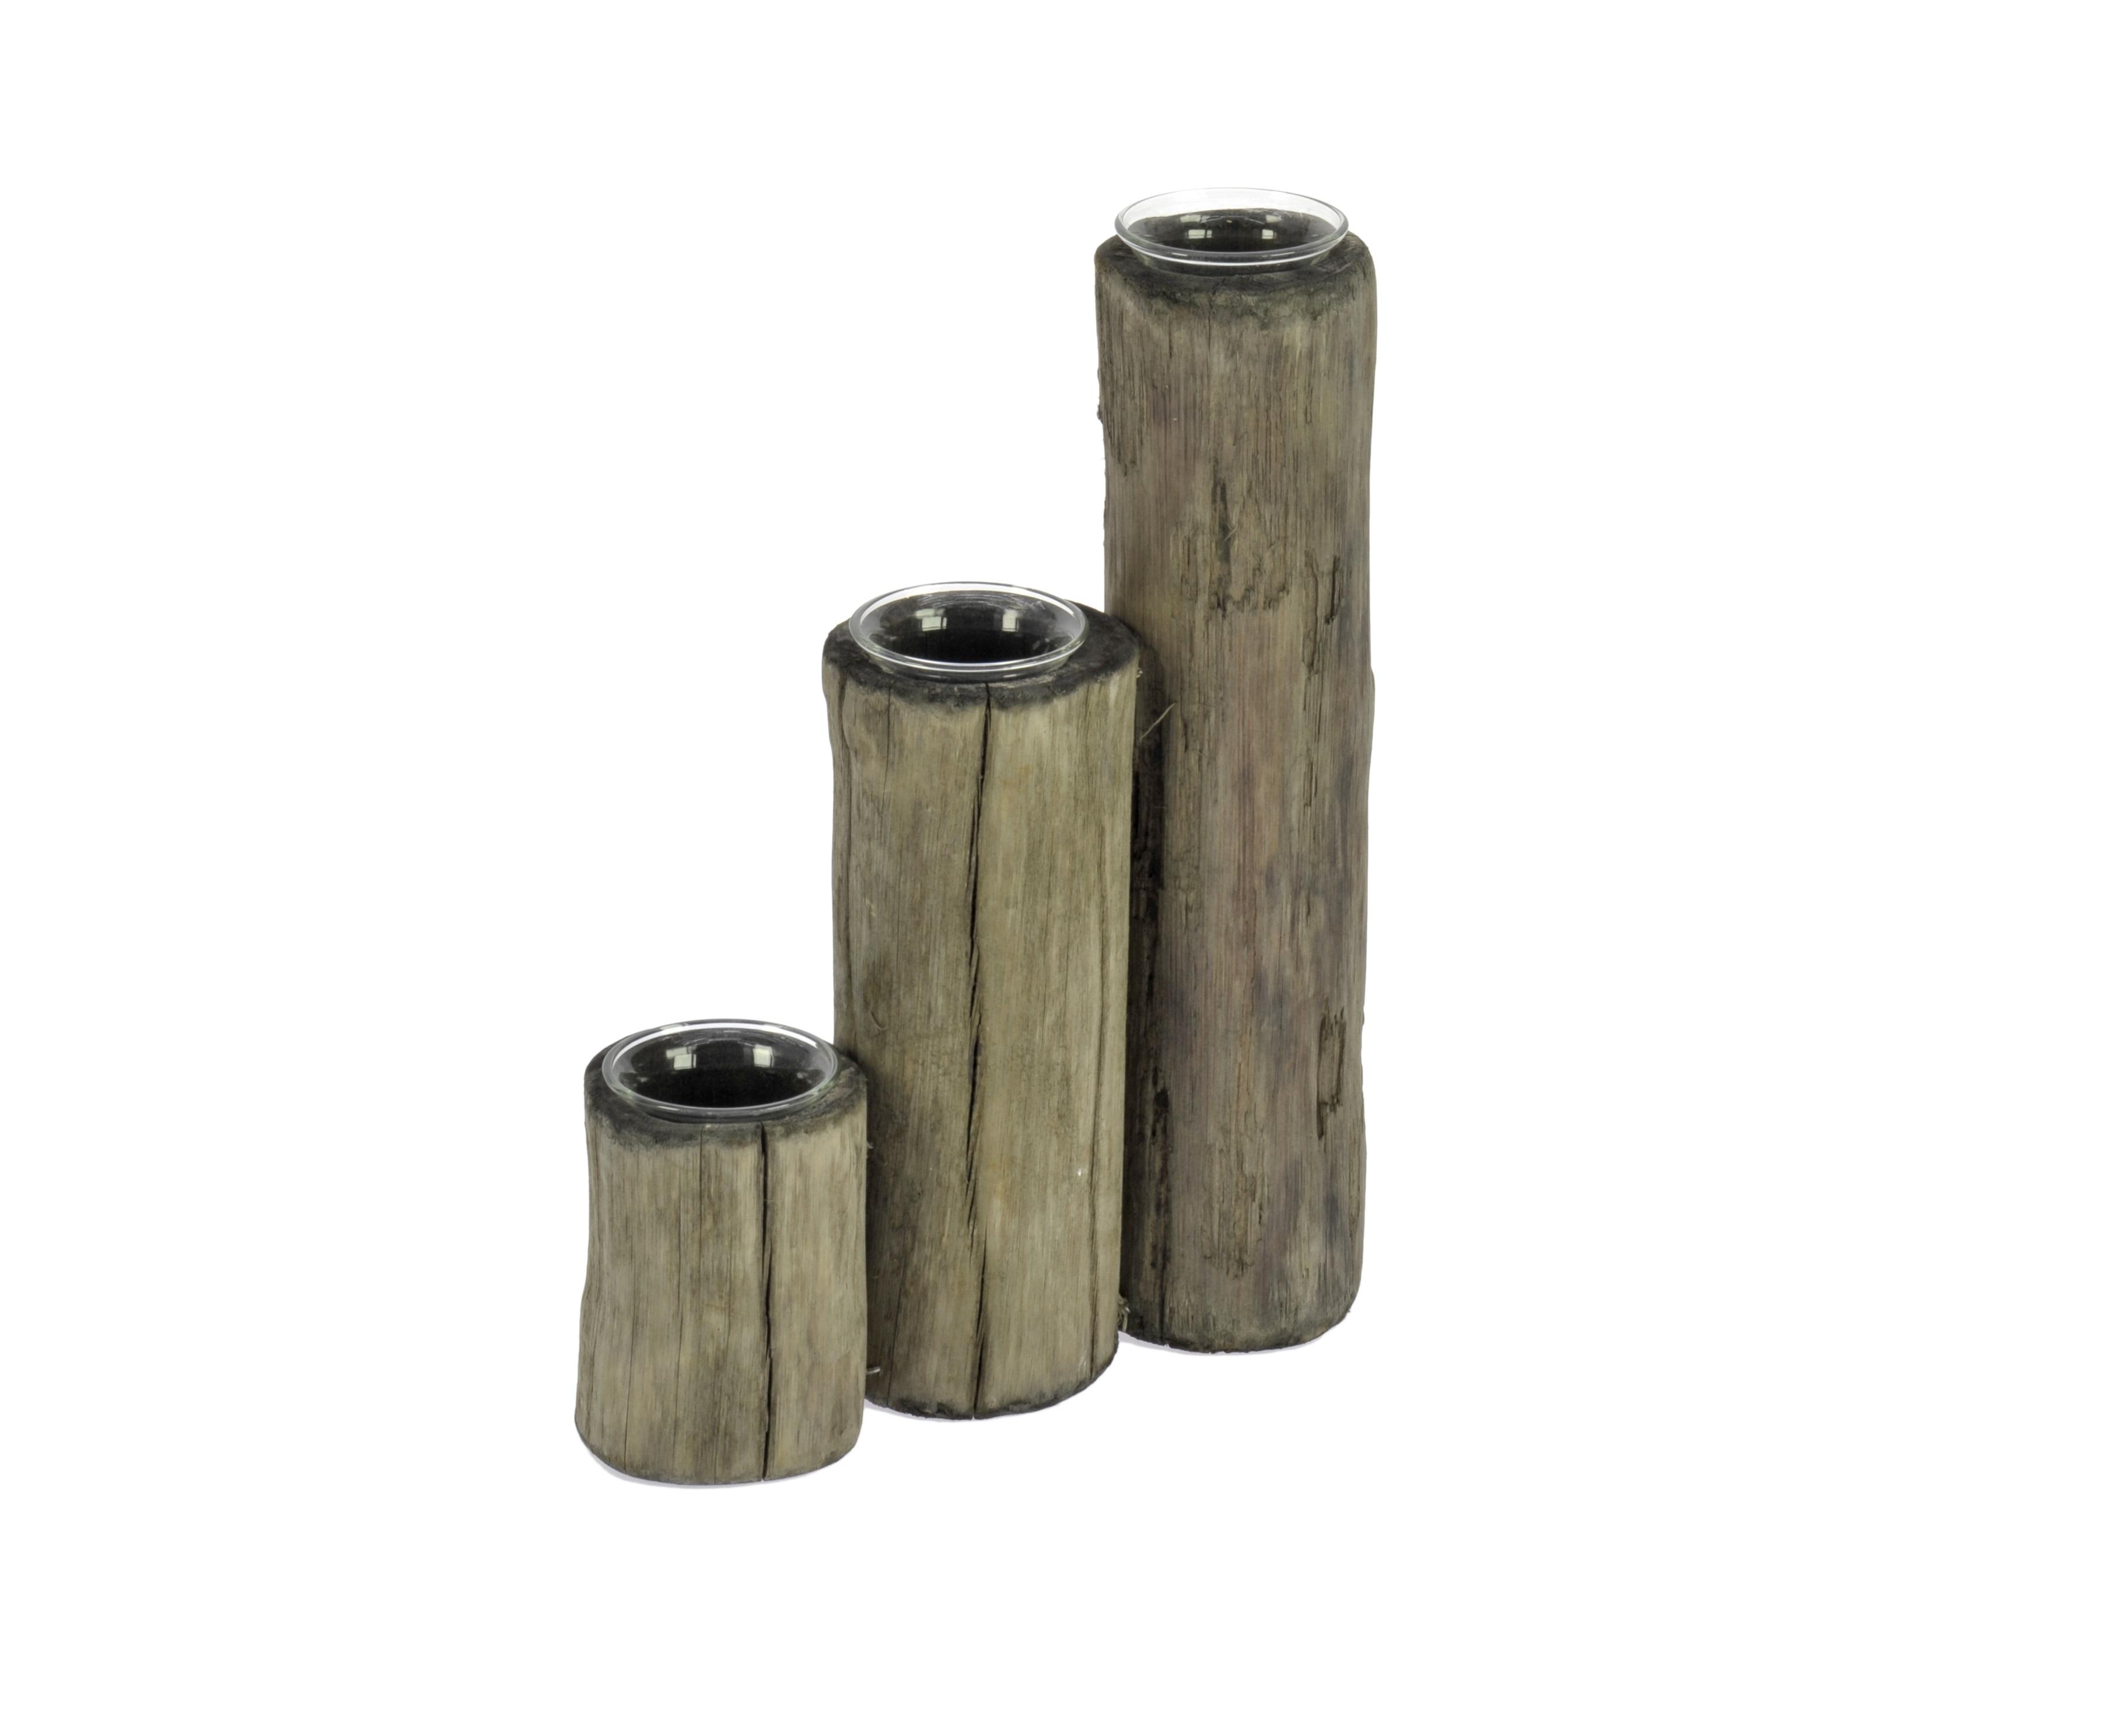 Подсвечник GreendyПодсвечники<br>&amp;lt;div&amp;gt;Материал: стекло, дерево.&amp;lt;br&amp;gt;&amp;lt;/div&amp;gt;<br><br>Material: Дерево<br>Length см: None<br>Width см: 24<br>Depth см: 10<br>Height см: 30